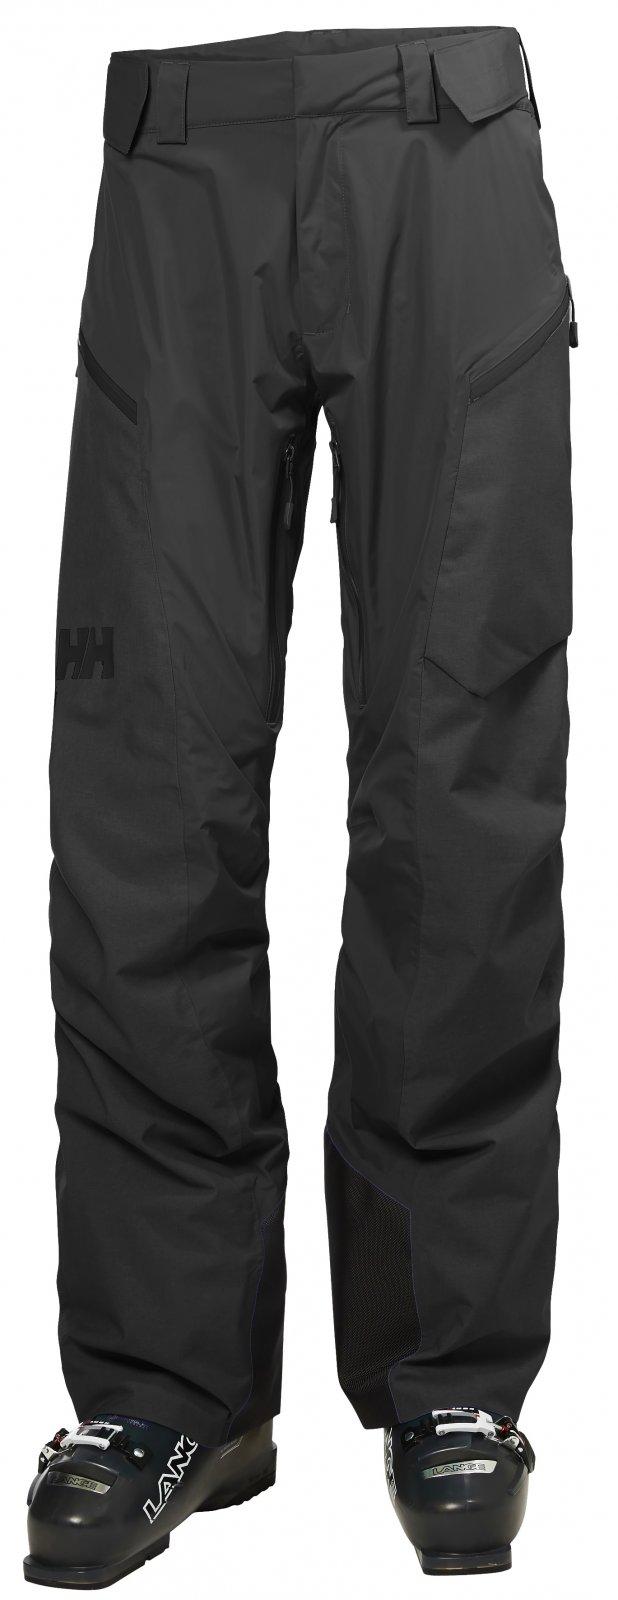 Helly Hansen Backbowl Cargo Pant 17/18